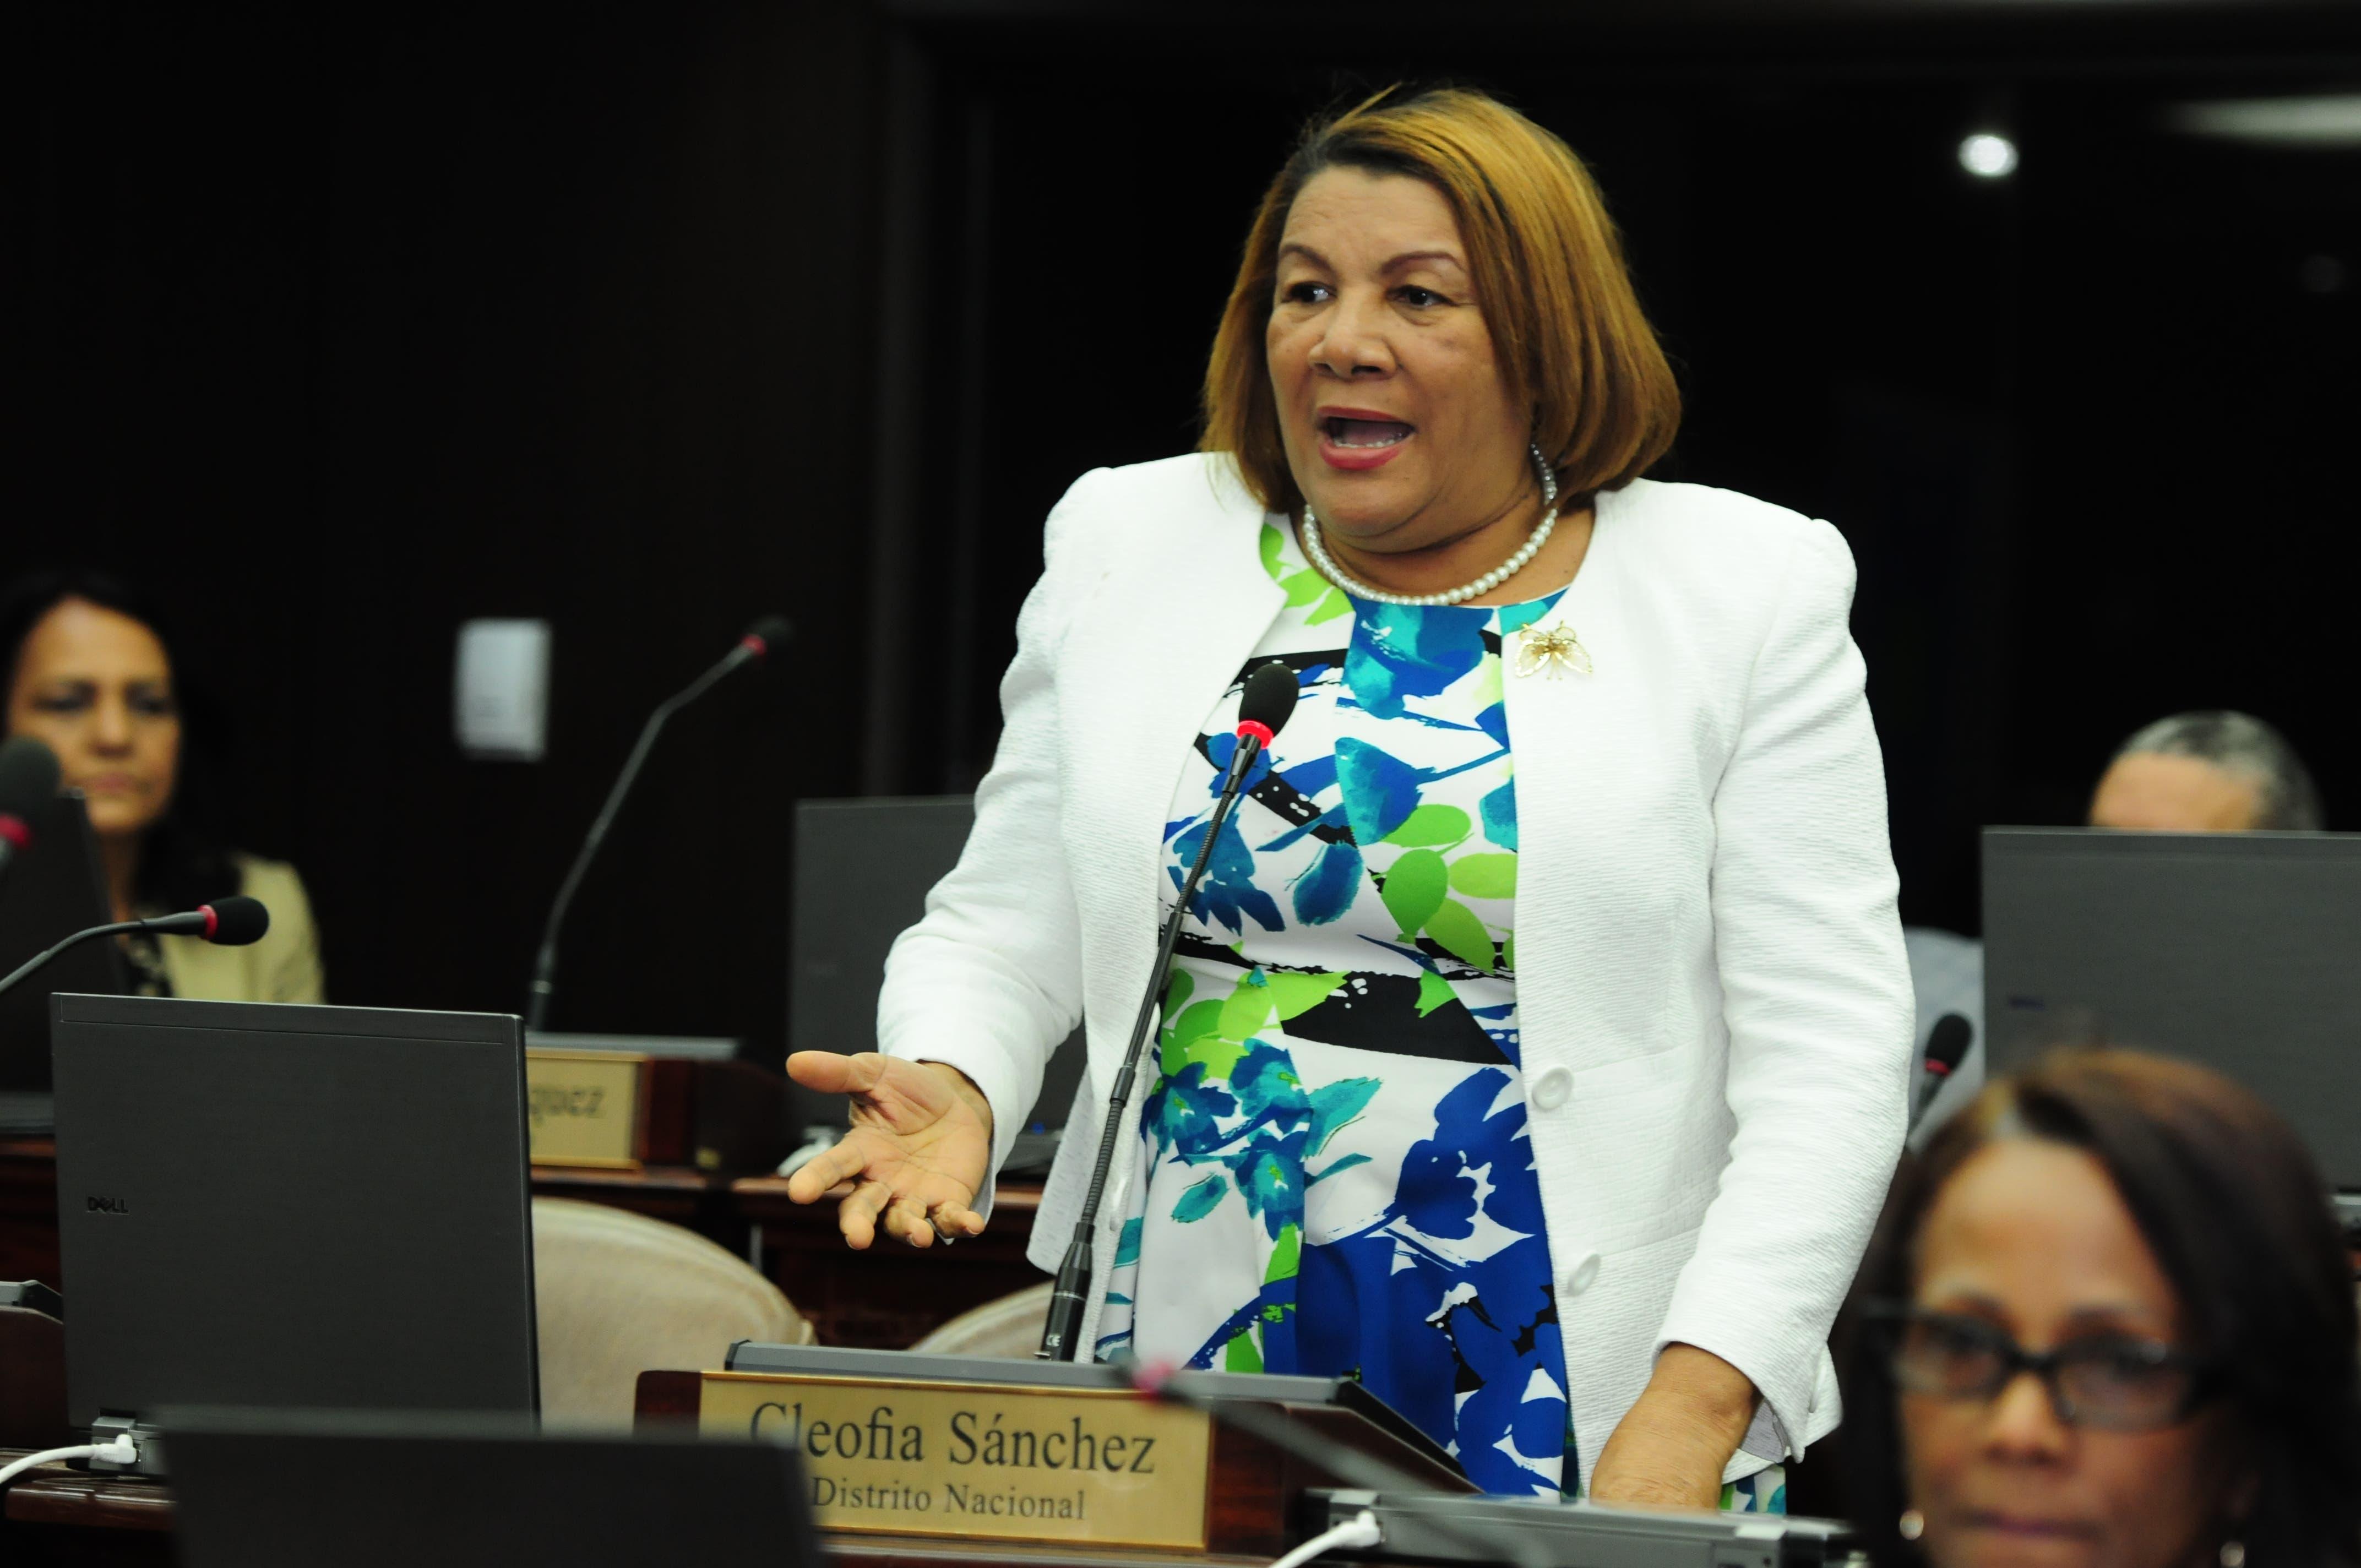 Diputados aprueban en proyecto ley que obliga servicio de salvavidas en balnearios